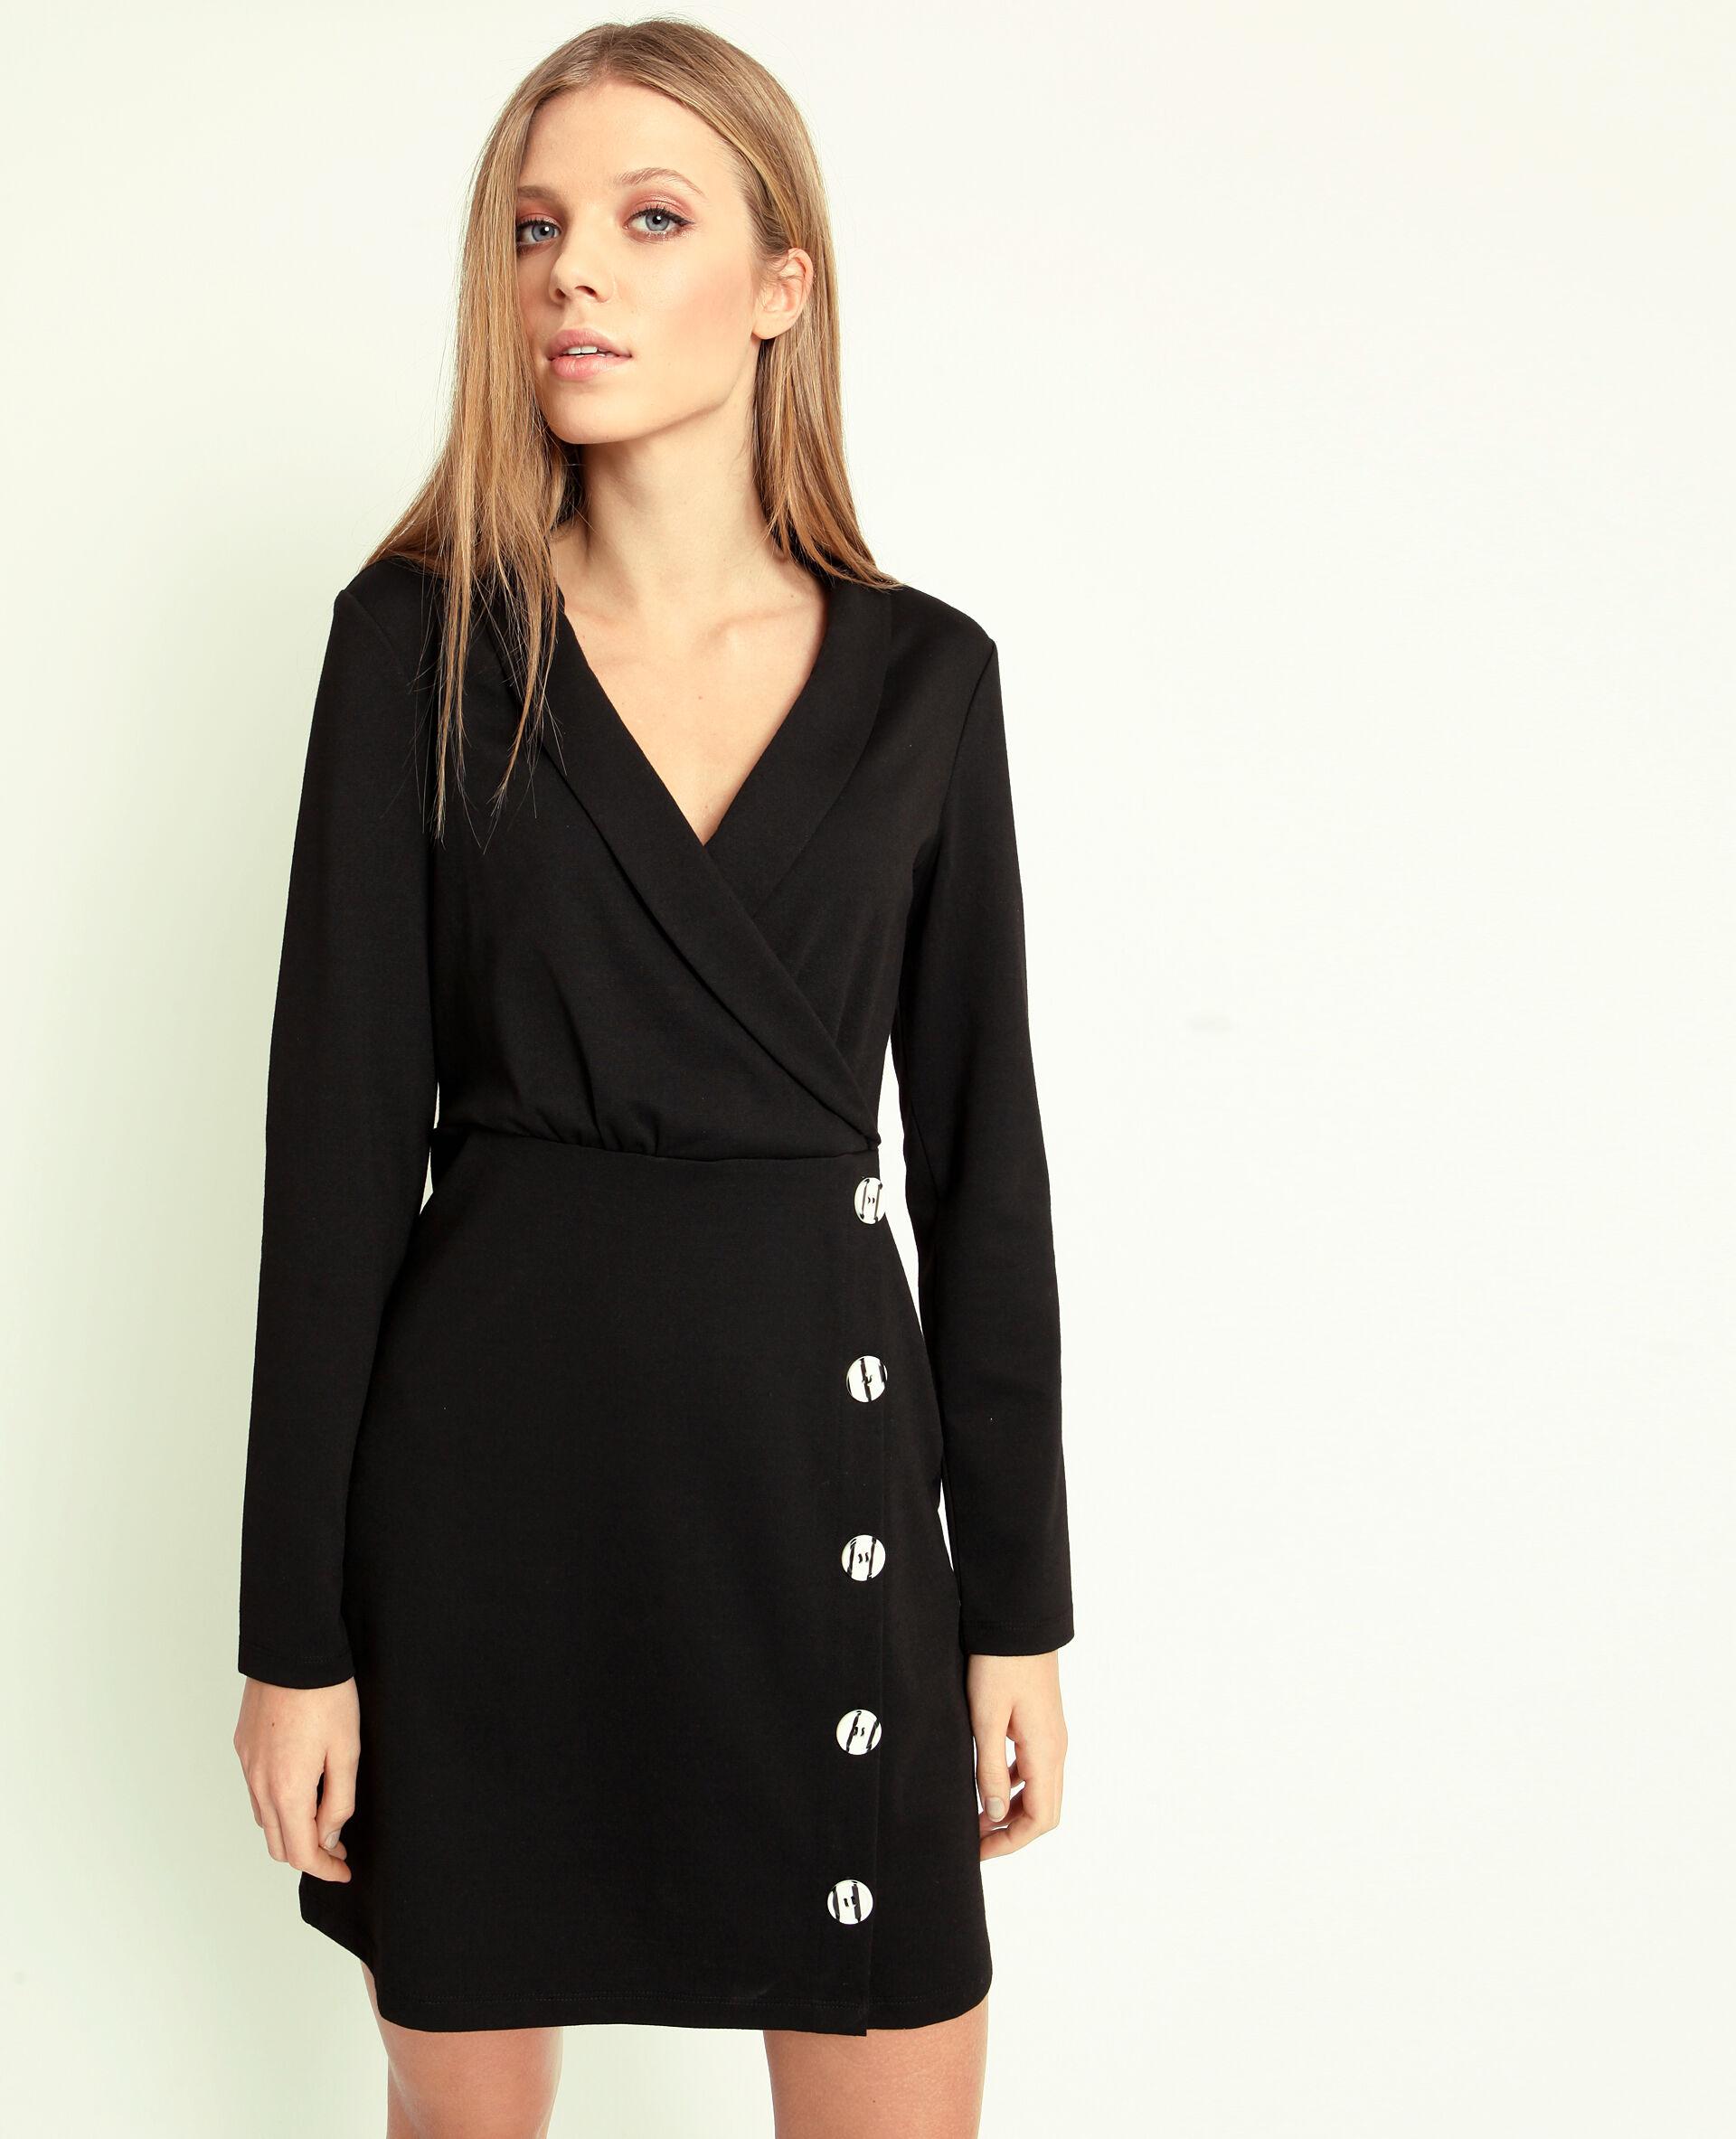 zwart kleedje met wit kraagje